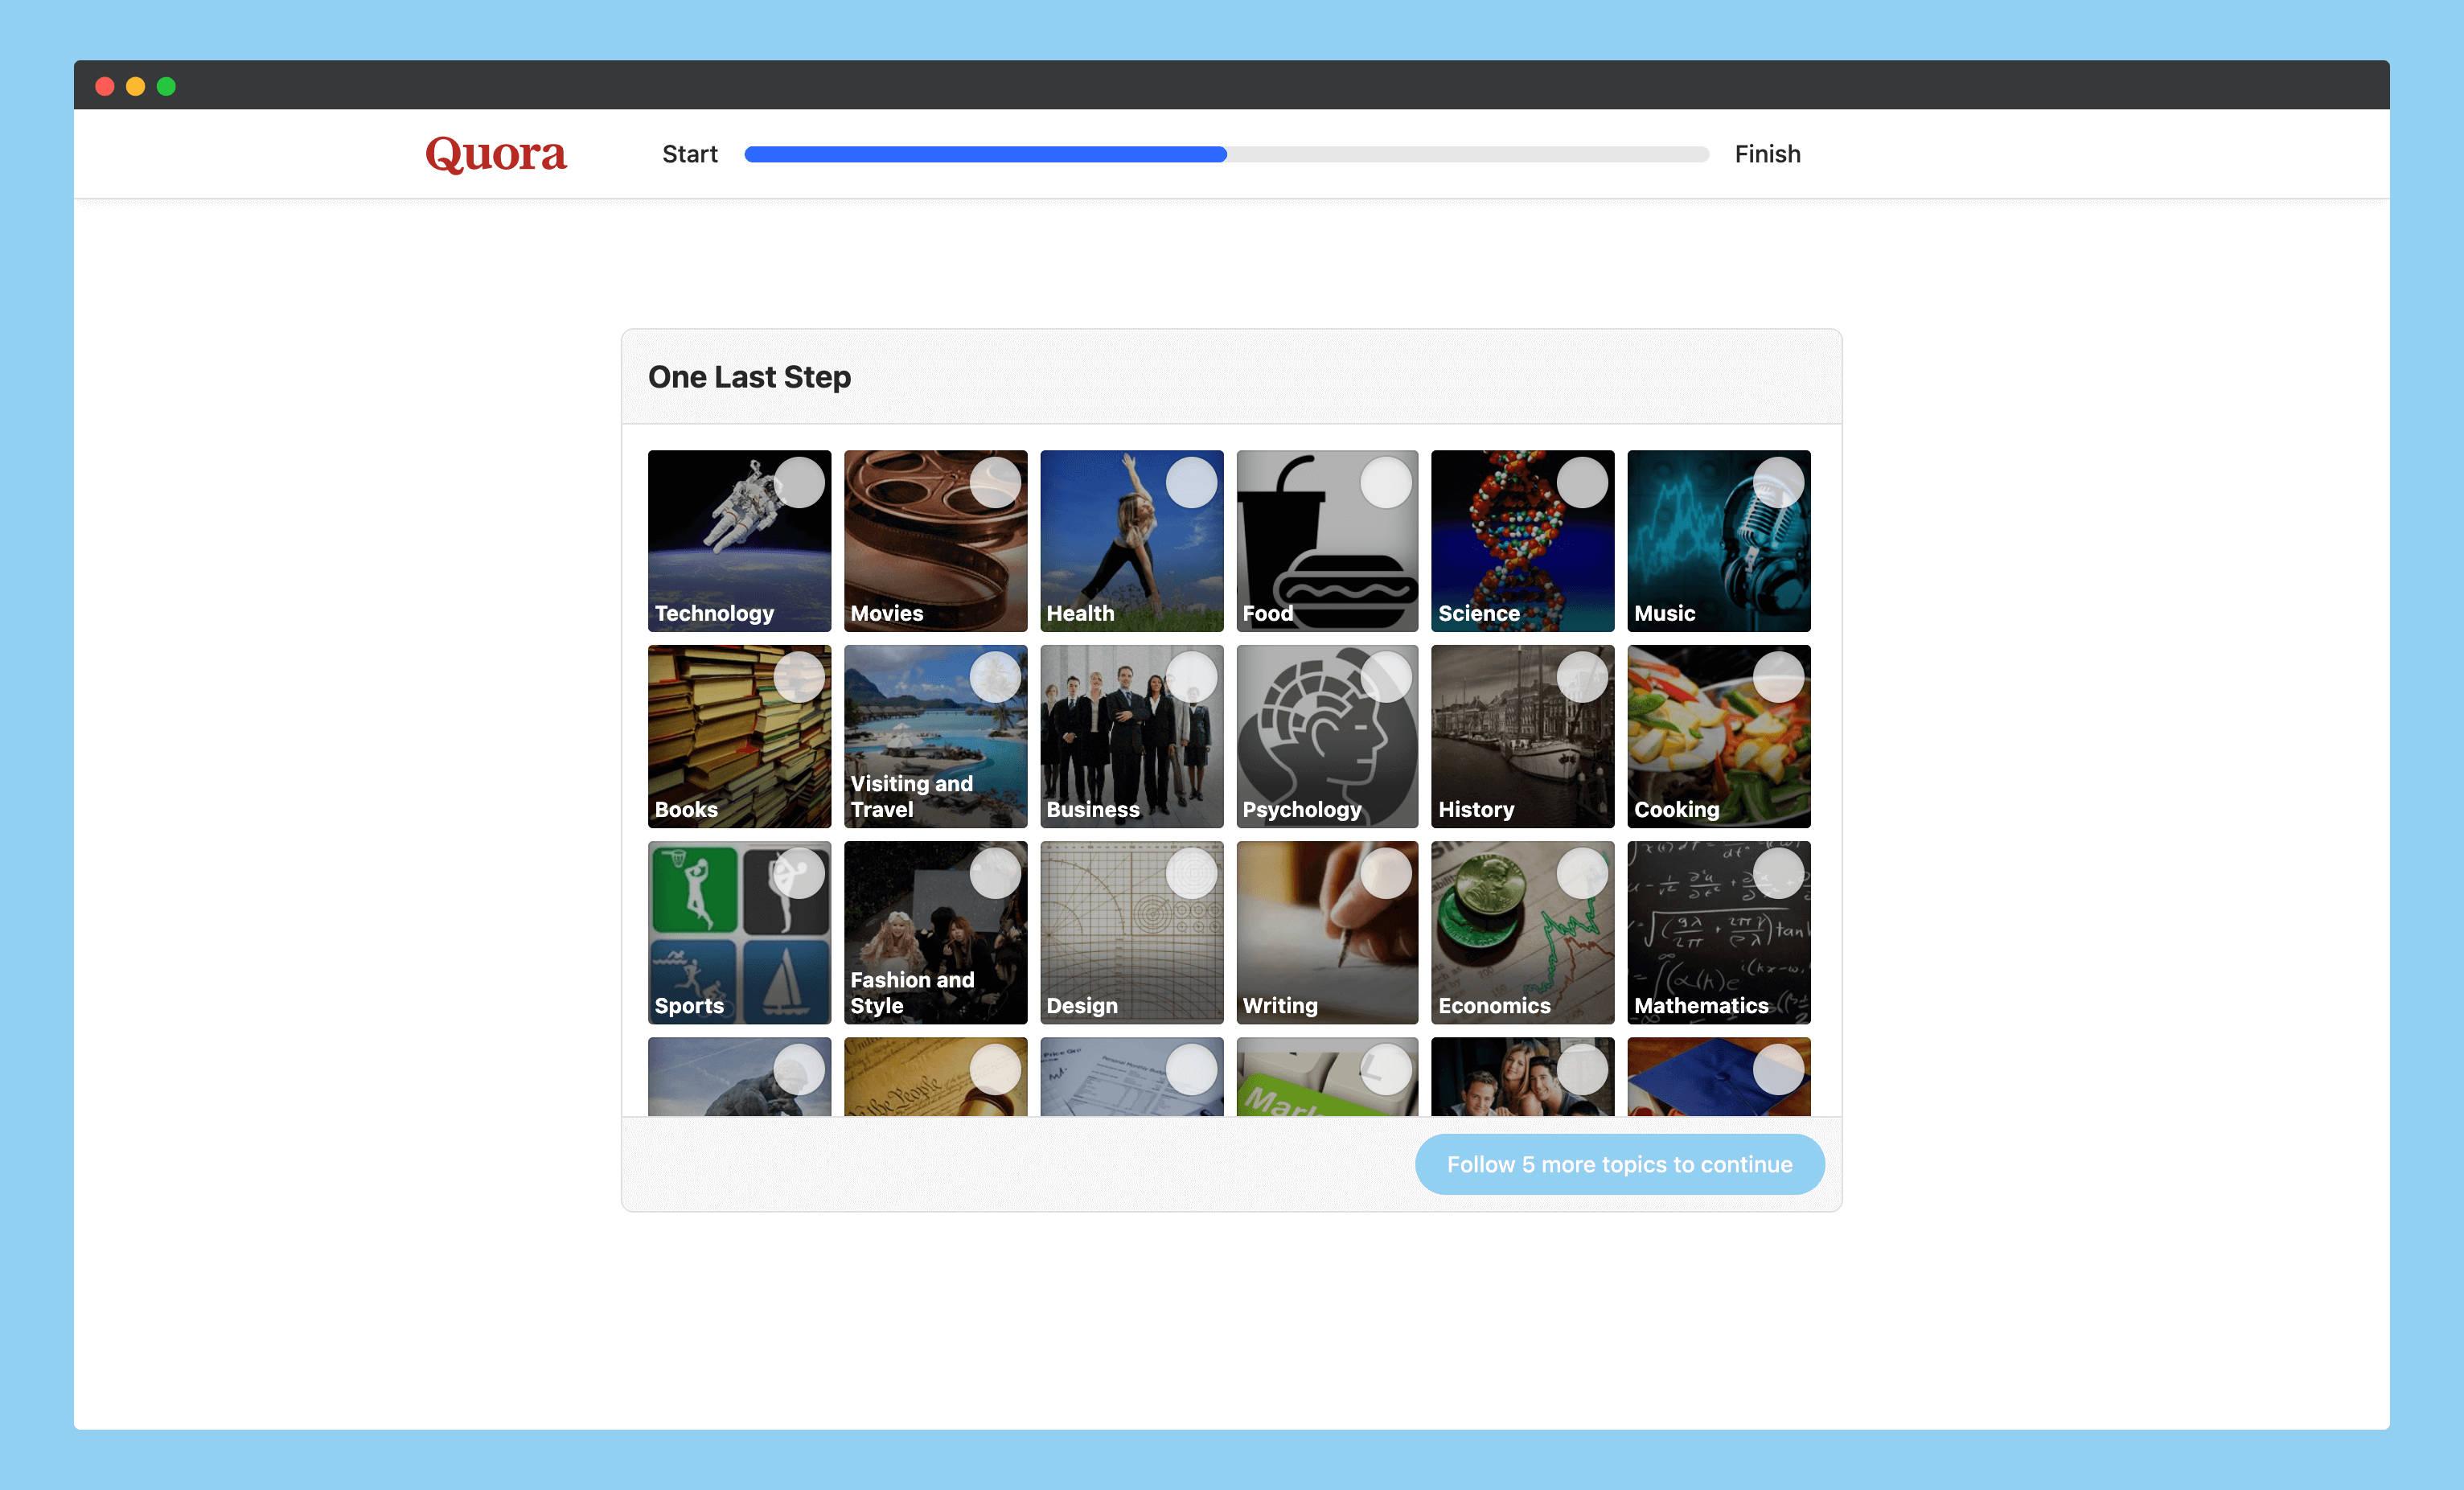 best profile creation sites, profile creation site list, Profile Creation Sites, profile creation sites for seo, profile creation sites free, profile creation sites list